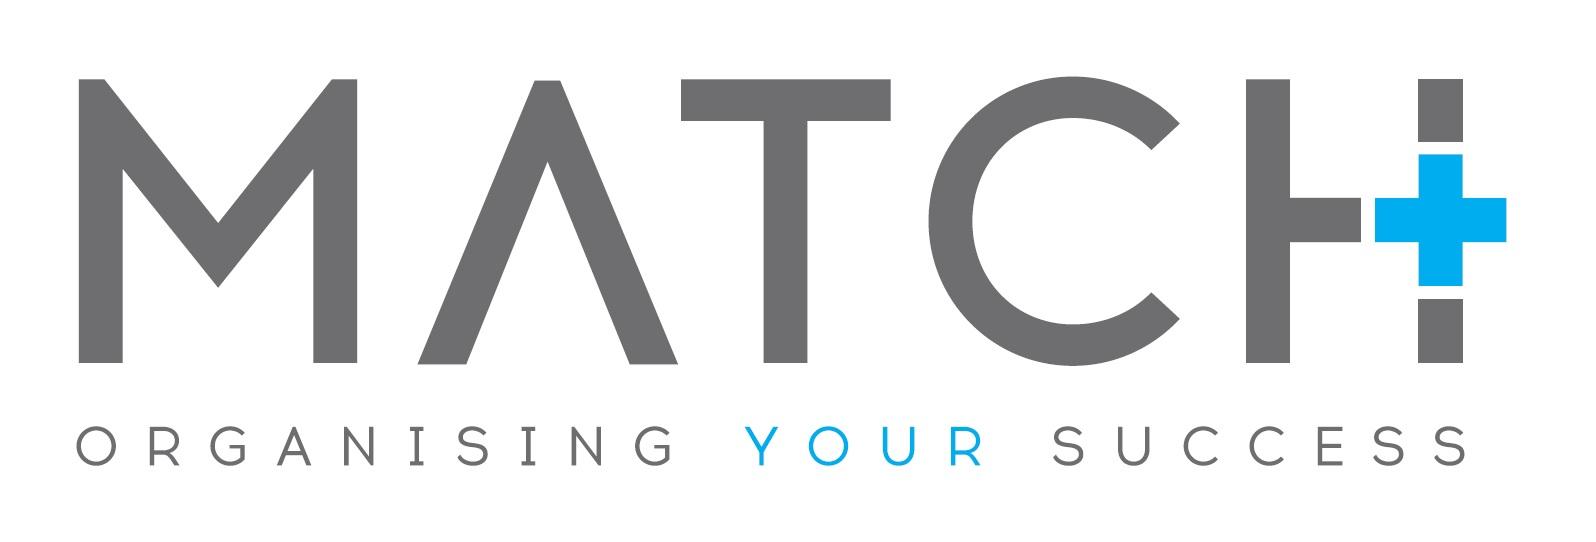 MatchPlus-logo-groot.jpg